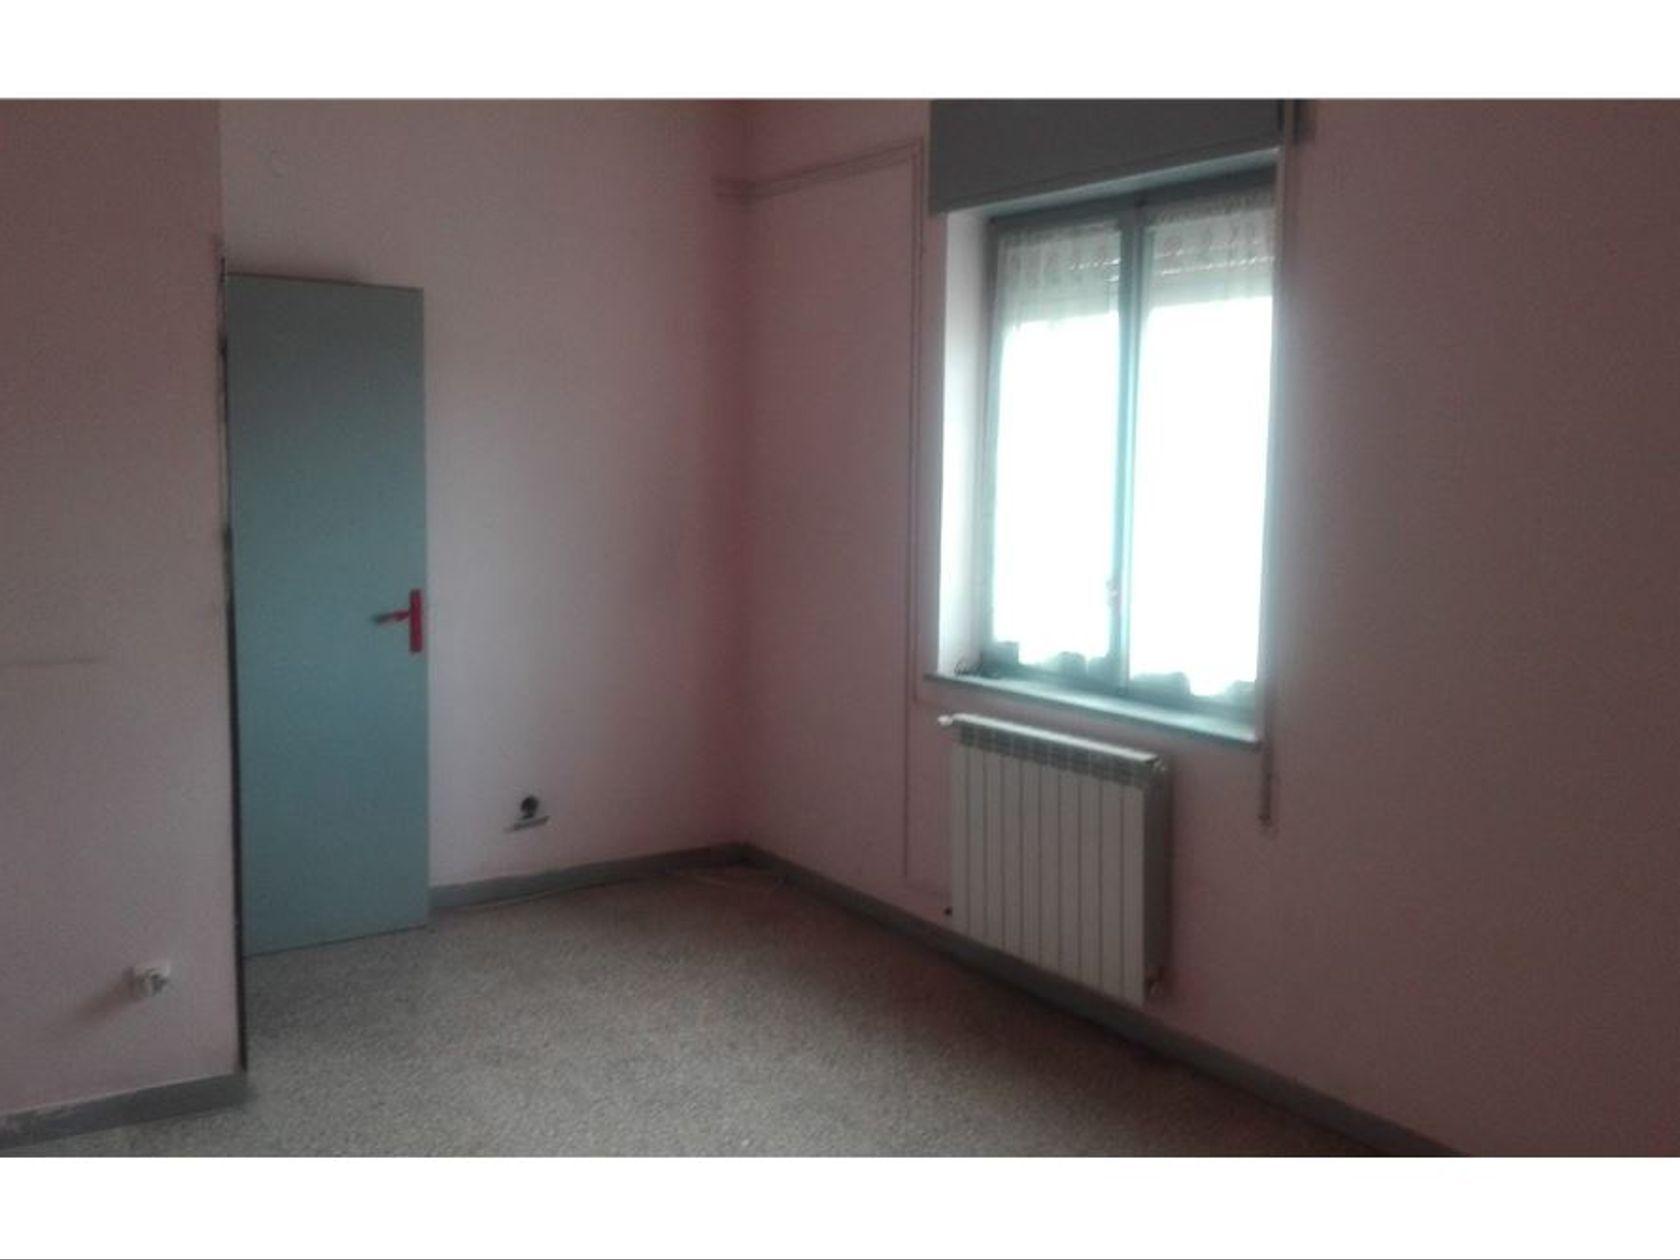 Appartamento Santa Maria, Catanzaro, CZ Vendita - Foto 13